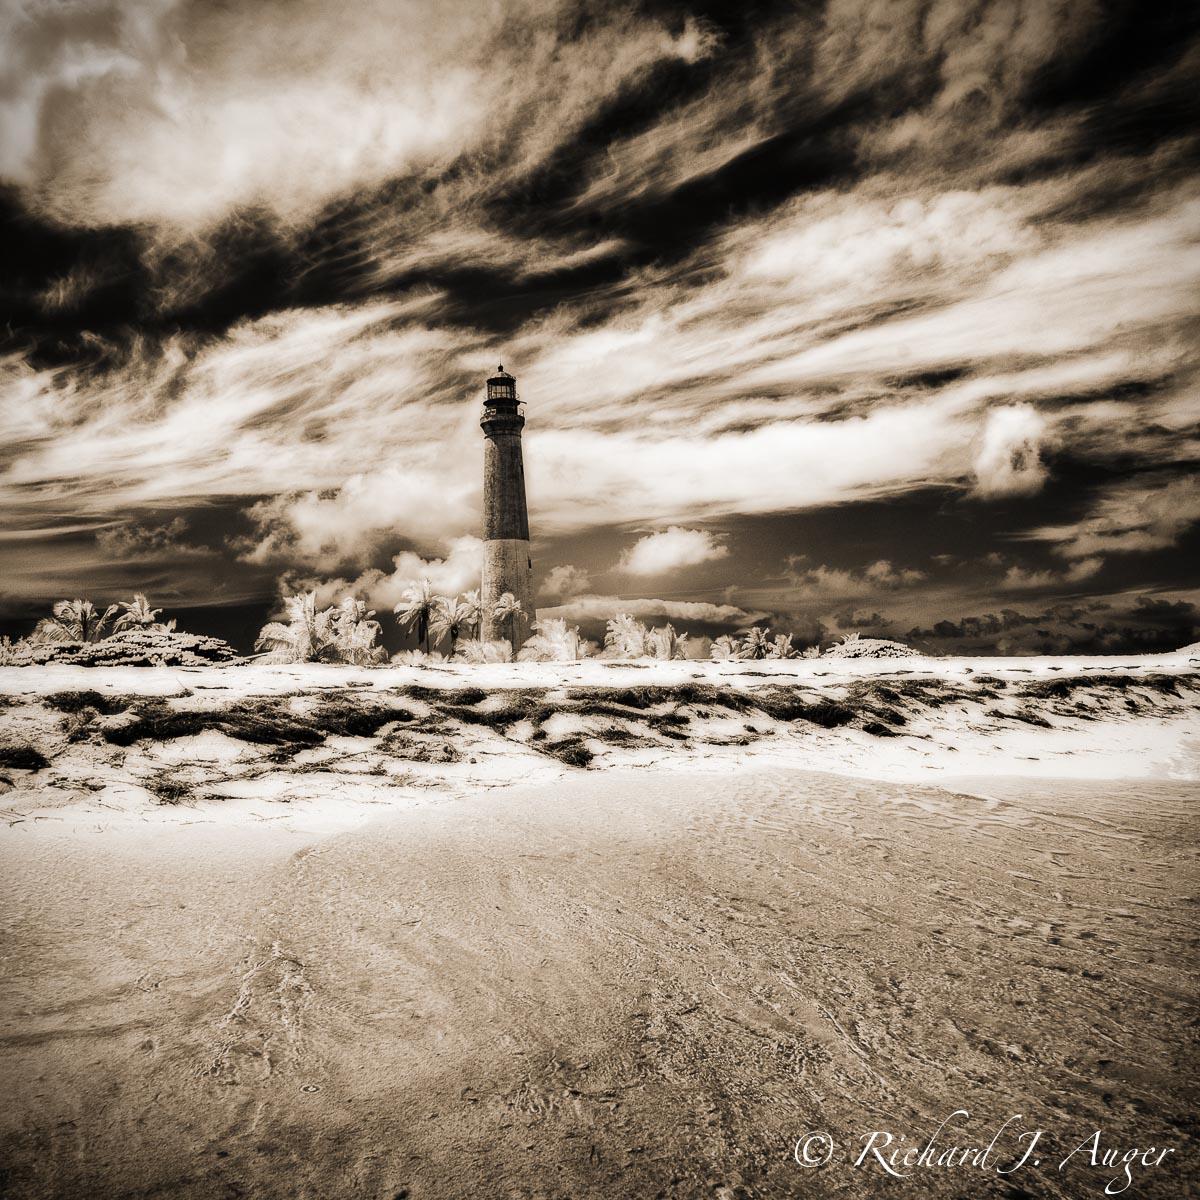 Loggerhead Lighthouse, Dry Tortugas National Park, Loggerhead Key, Storm, Water, Drama, Landscape, Photograph, sepia tone, monochrome